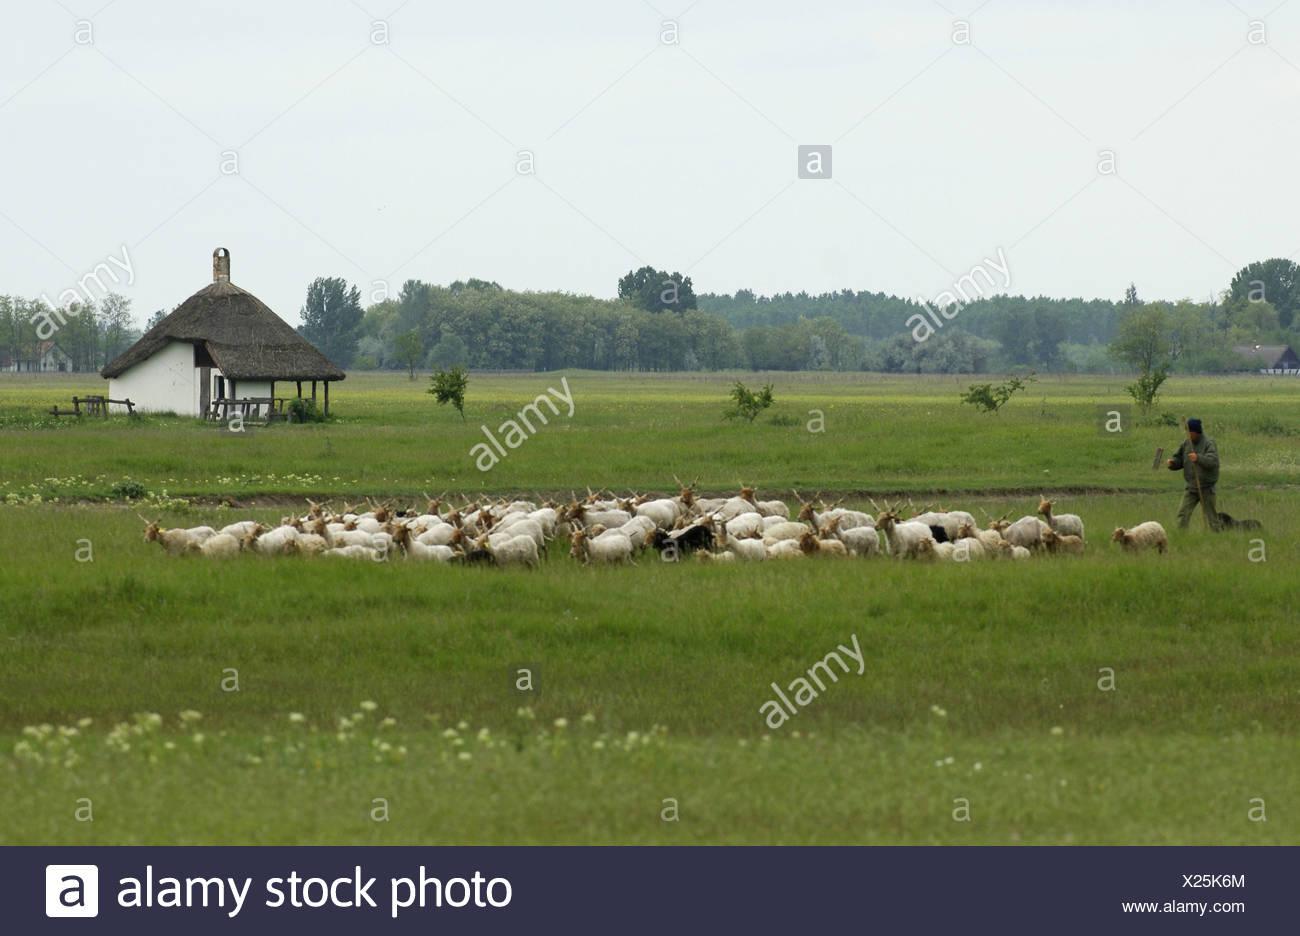 Walachian (Ovis ammon f. aries), herd with shepherd, Hungary - Stock Image